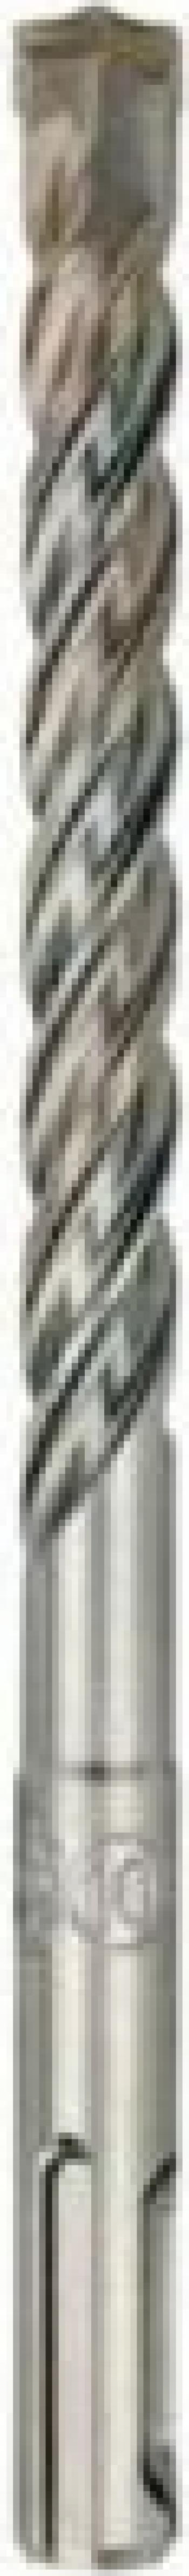 Burghiu SDS-plus EXTREME 2 10x200x260 mm Dewalt Accesorii masini de gaurit